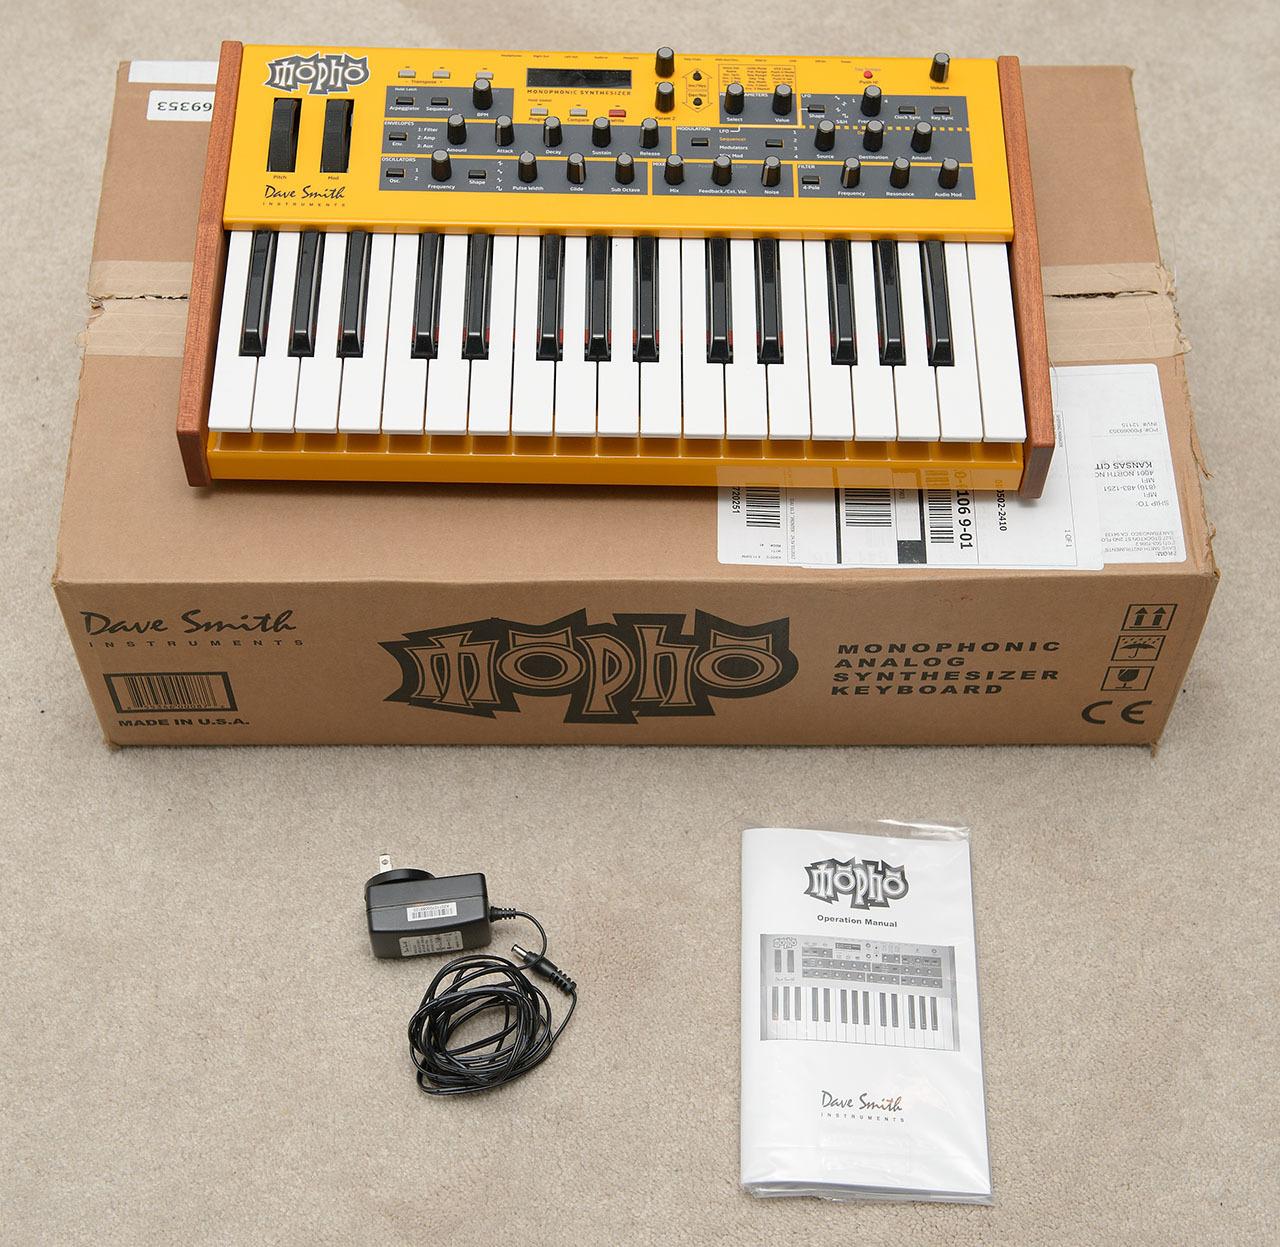 matrixsynth dave smith instruments mopho keyboard with original box rh matrixsynth com dsi tetra manual pdf dave smith mopho keyboard manual